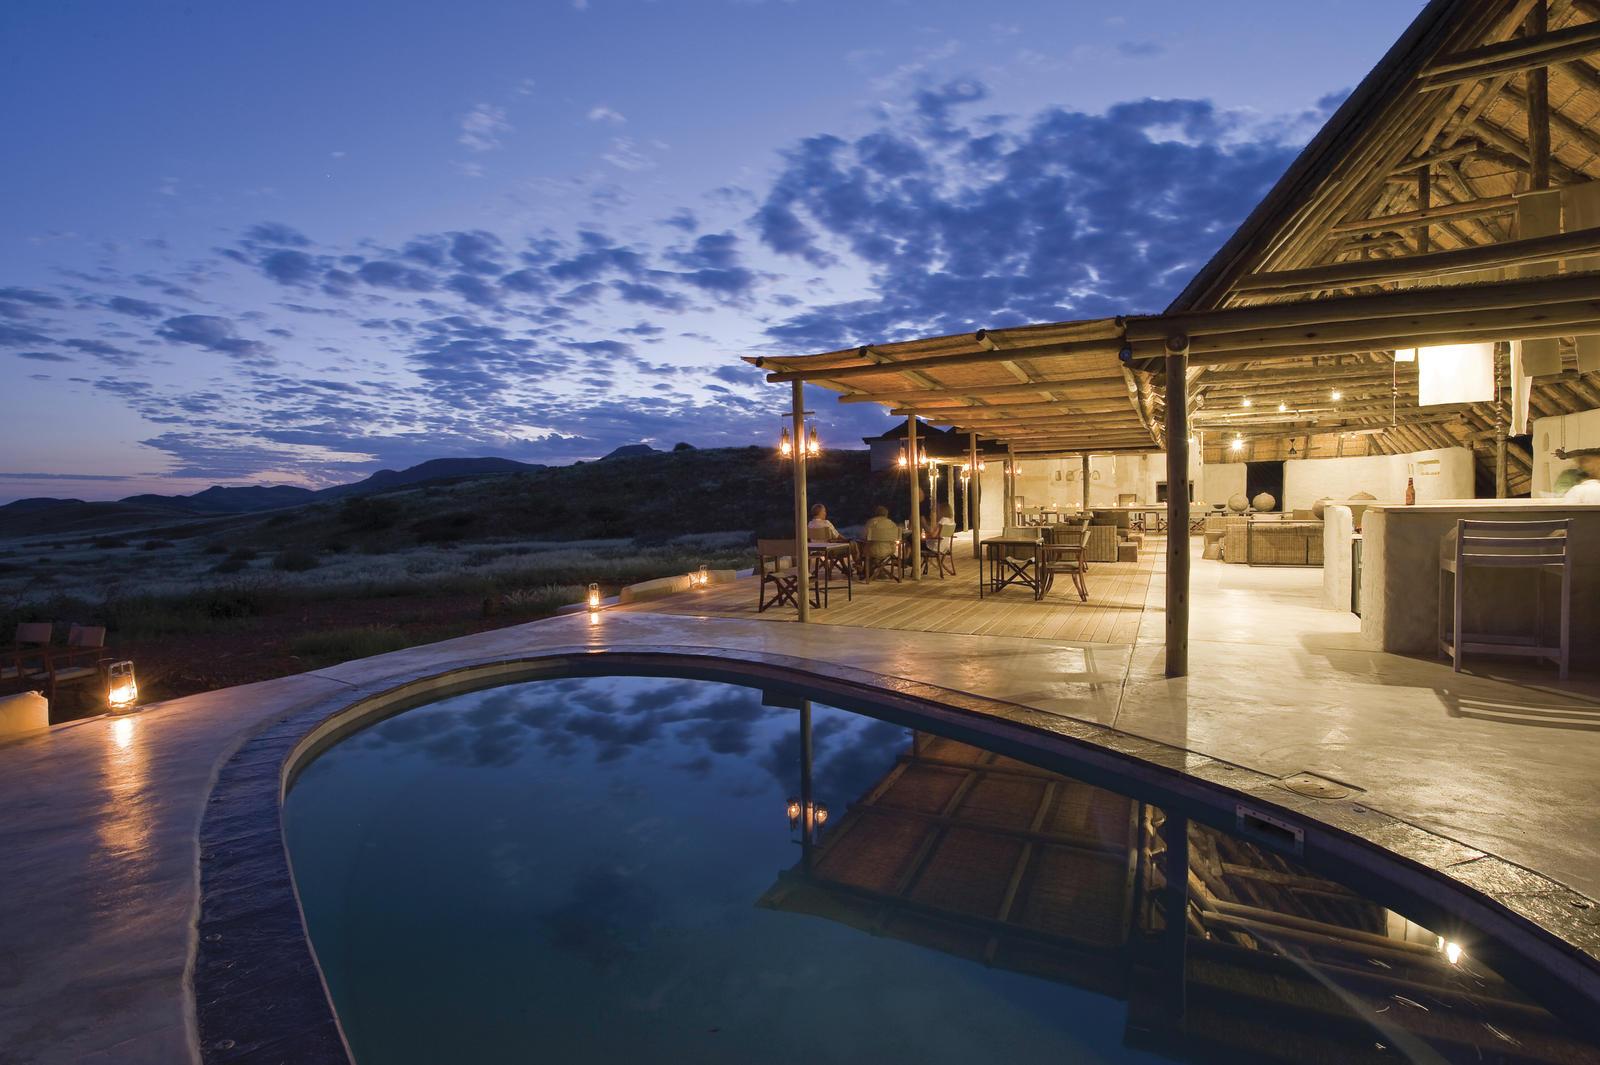 Damaraland_Camp_pool_at_sunset_(c)_Dana_Allen